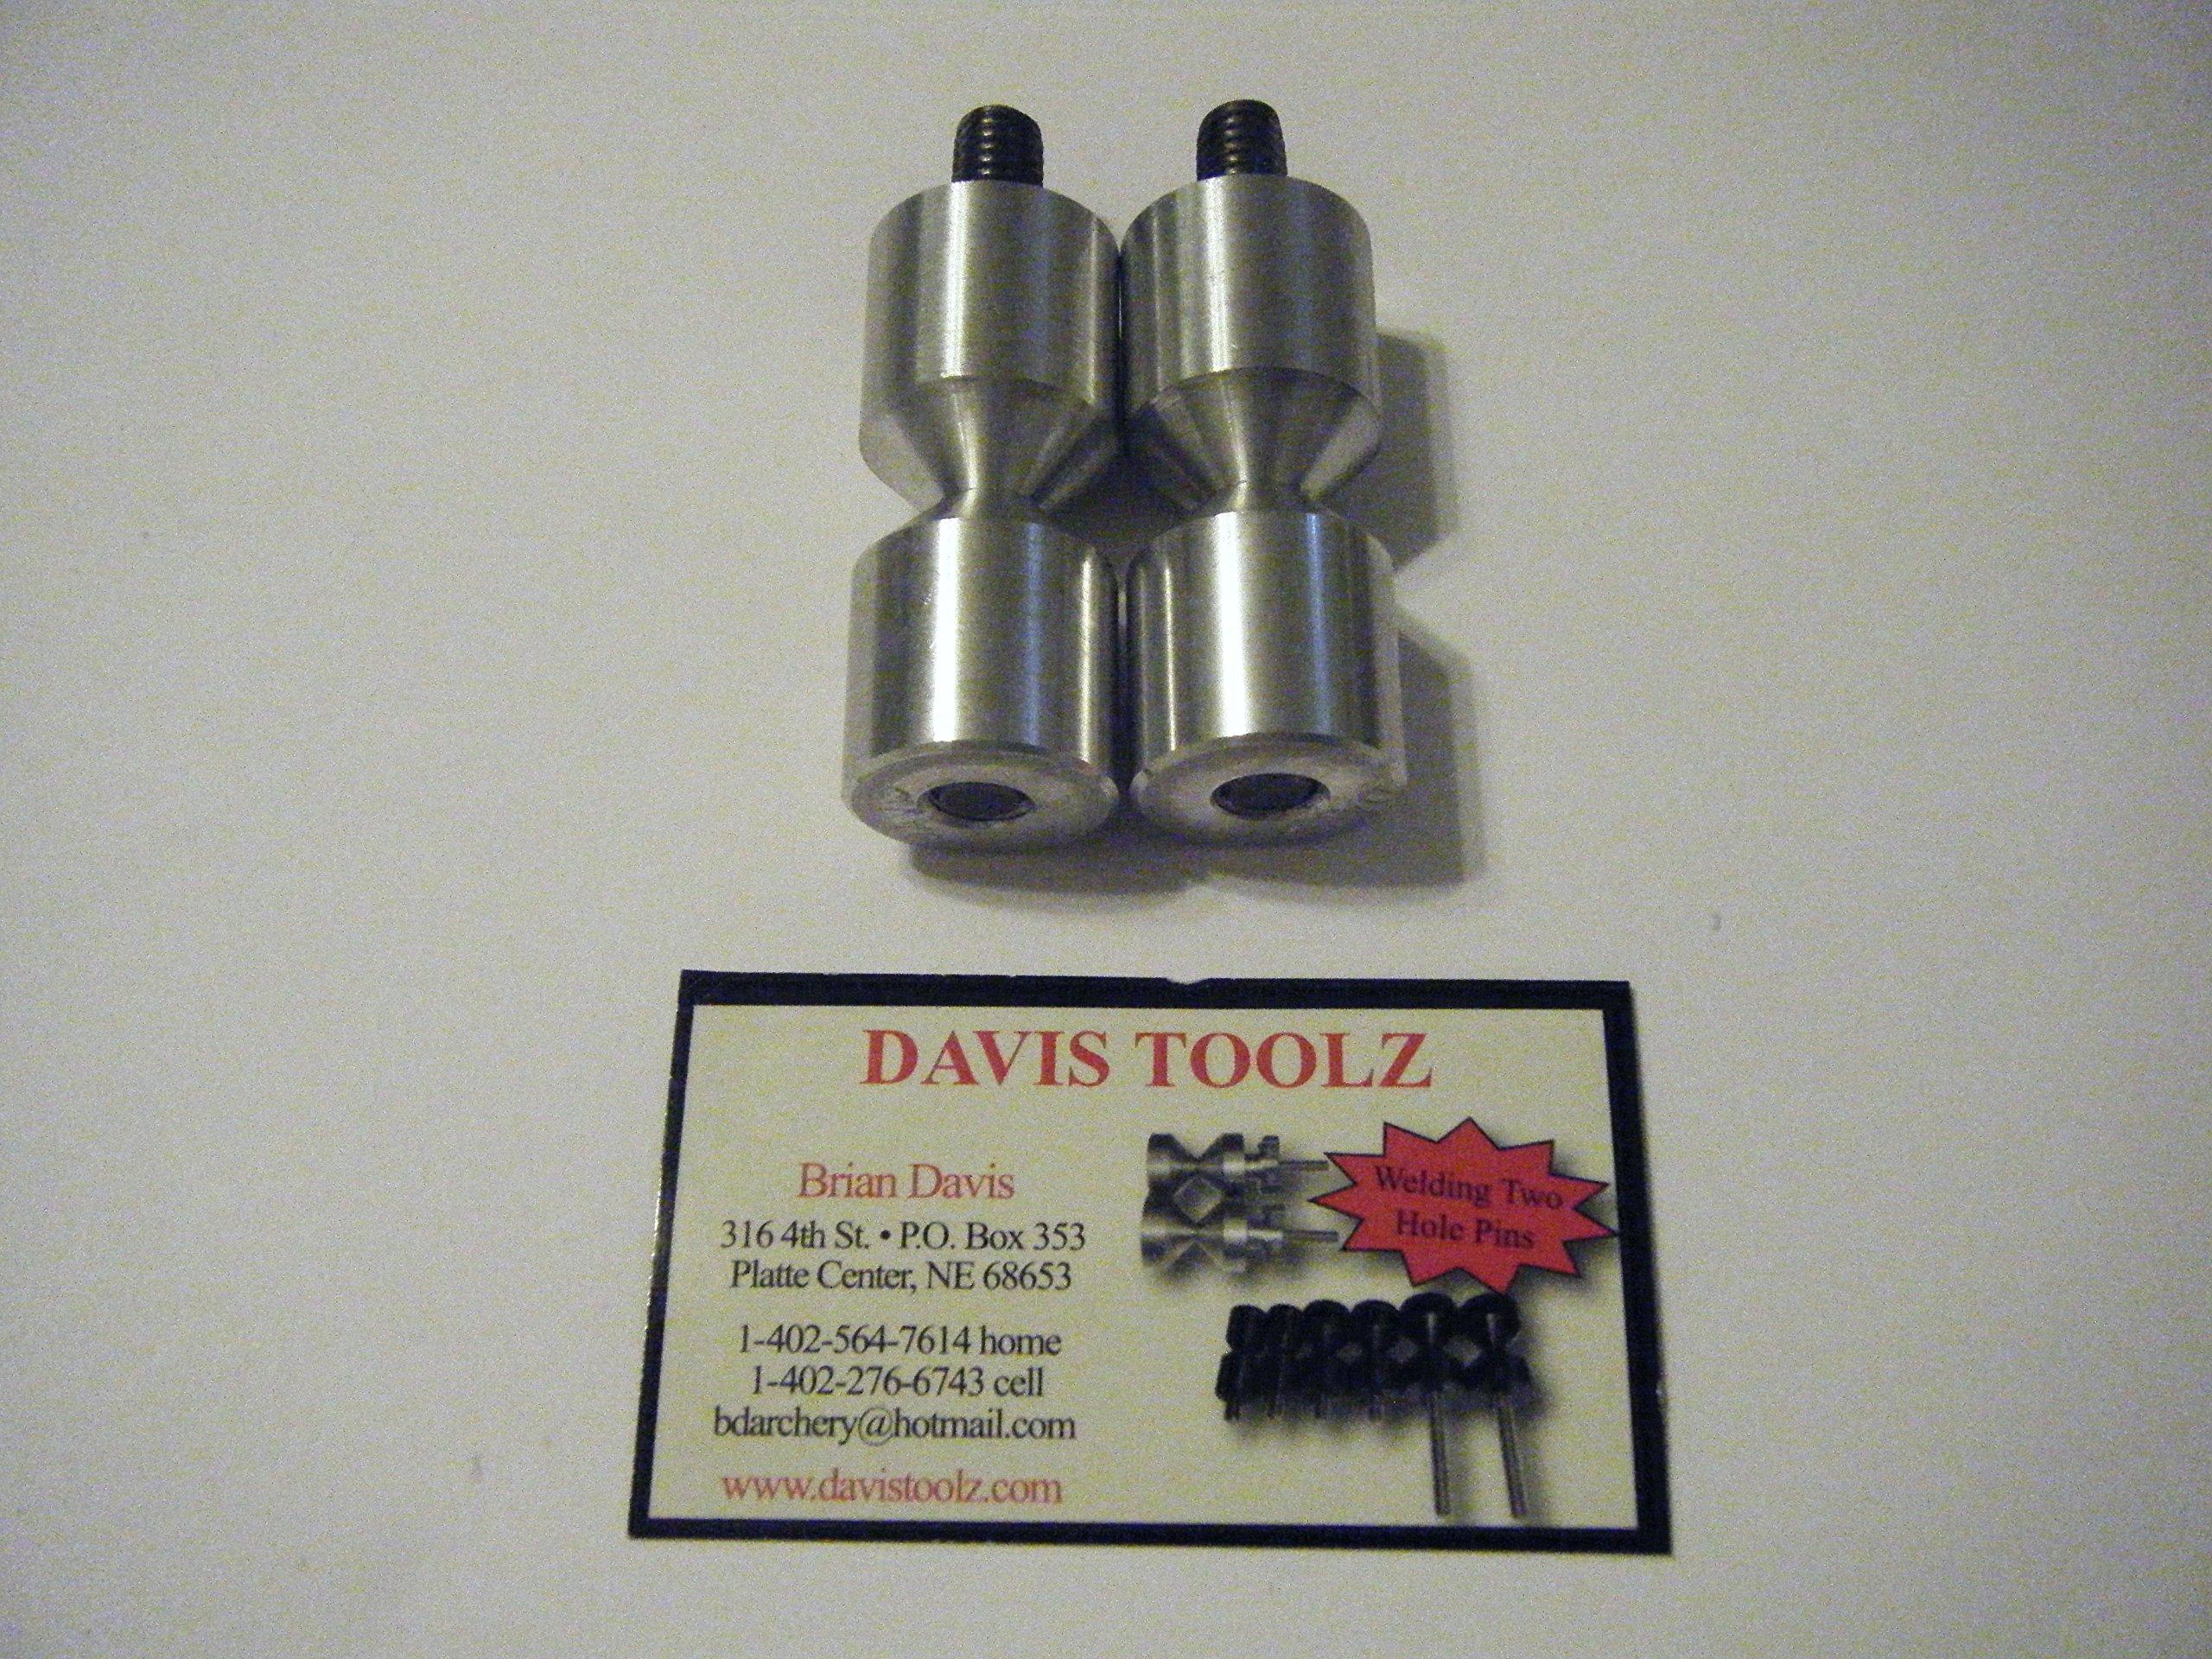 Davis 1'' Alum. two hole pins